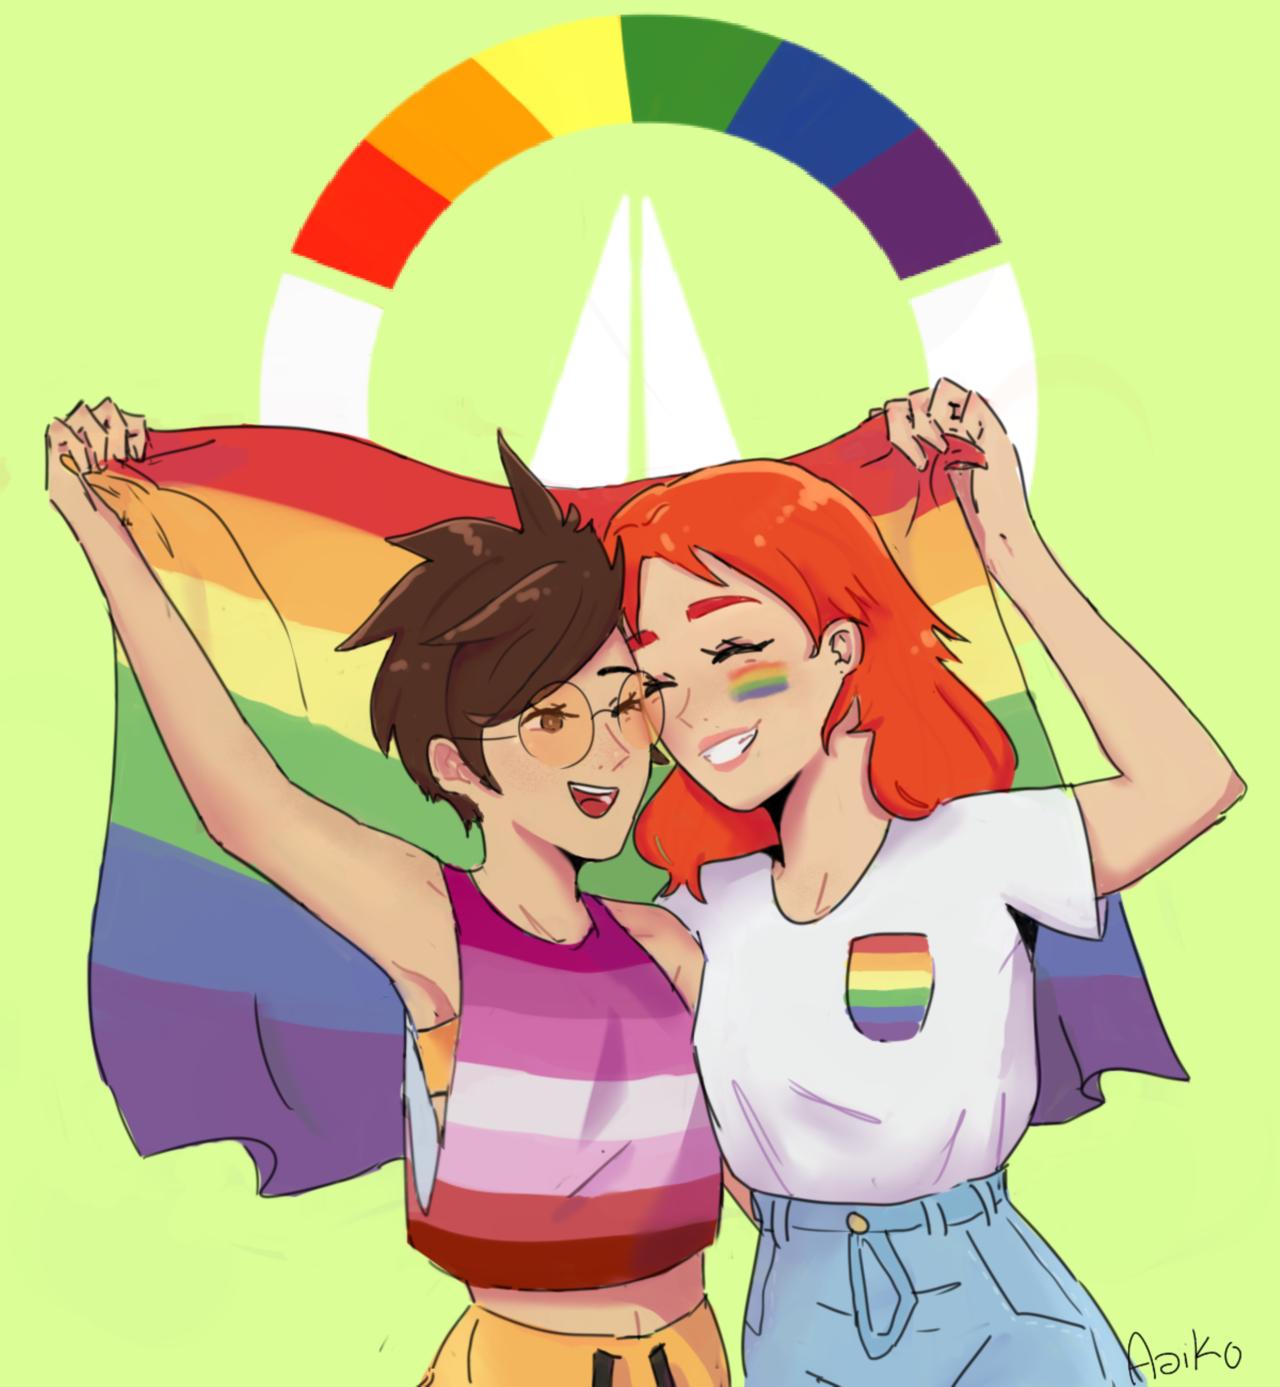 gay teen prono